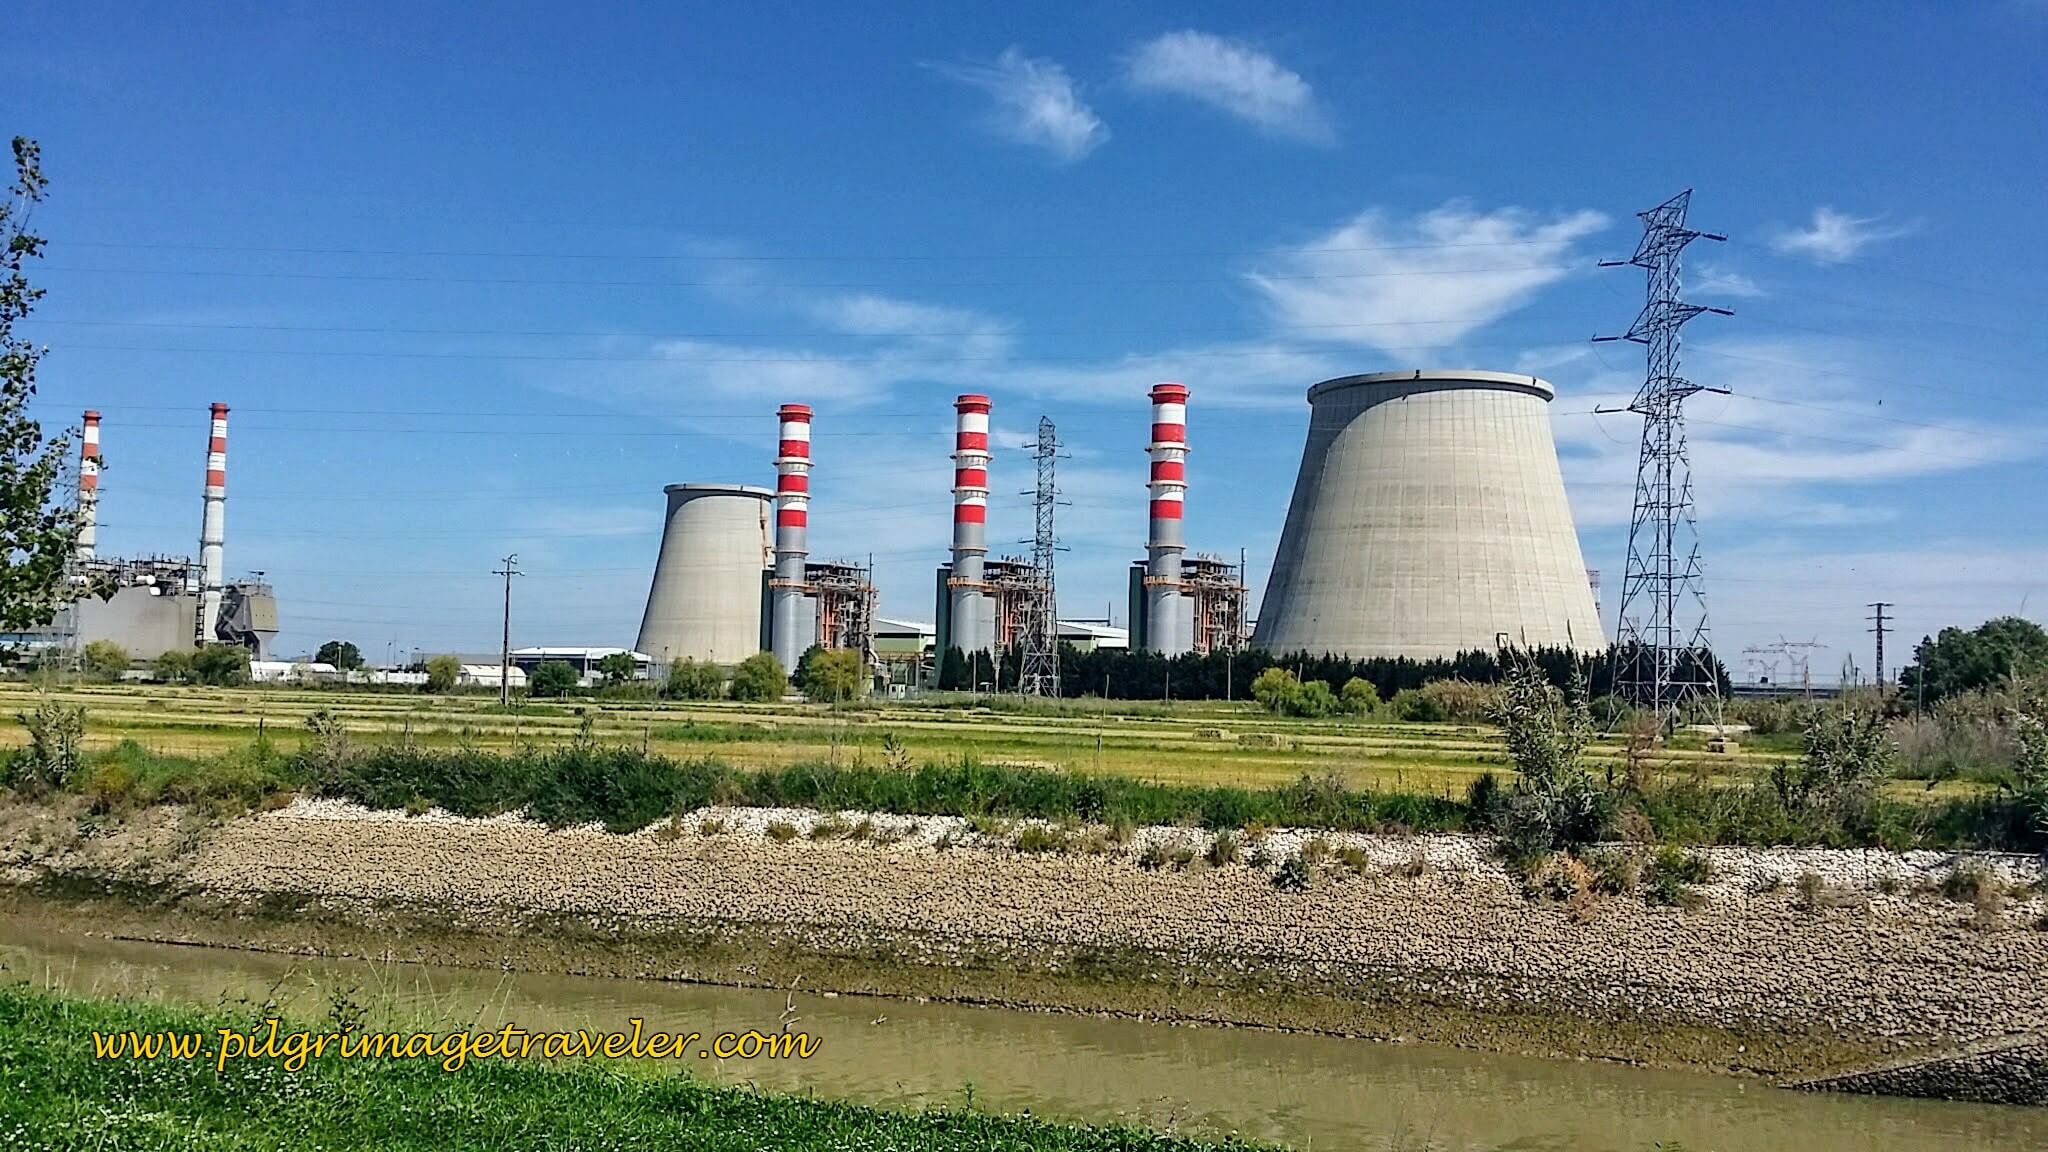 Ribatejo Power Station, Carregado, Portugal